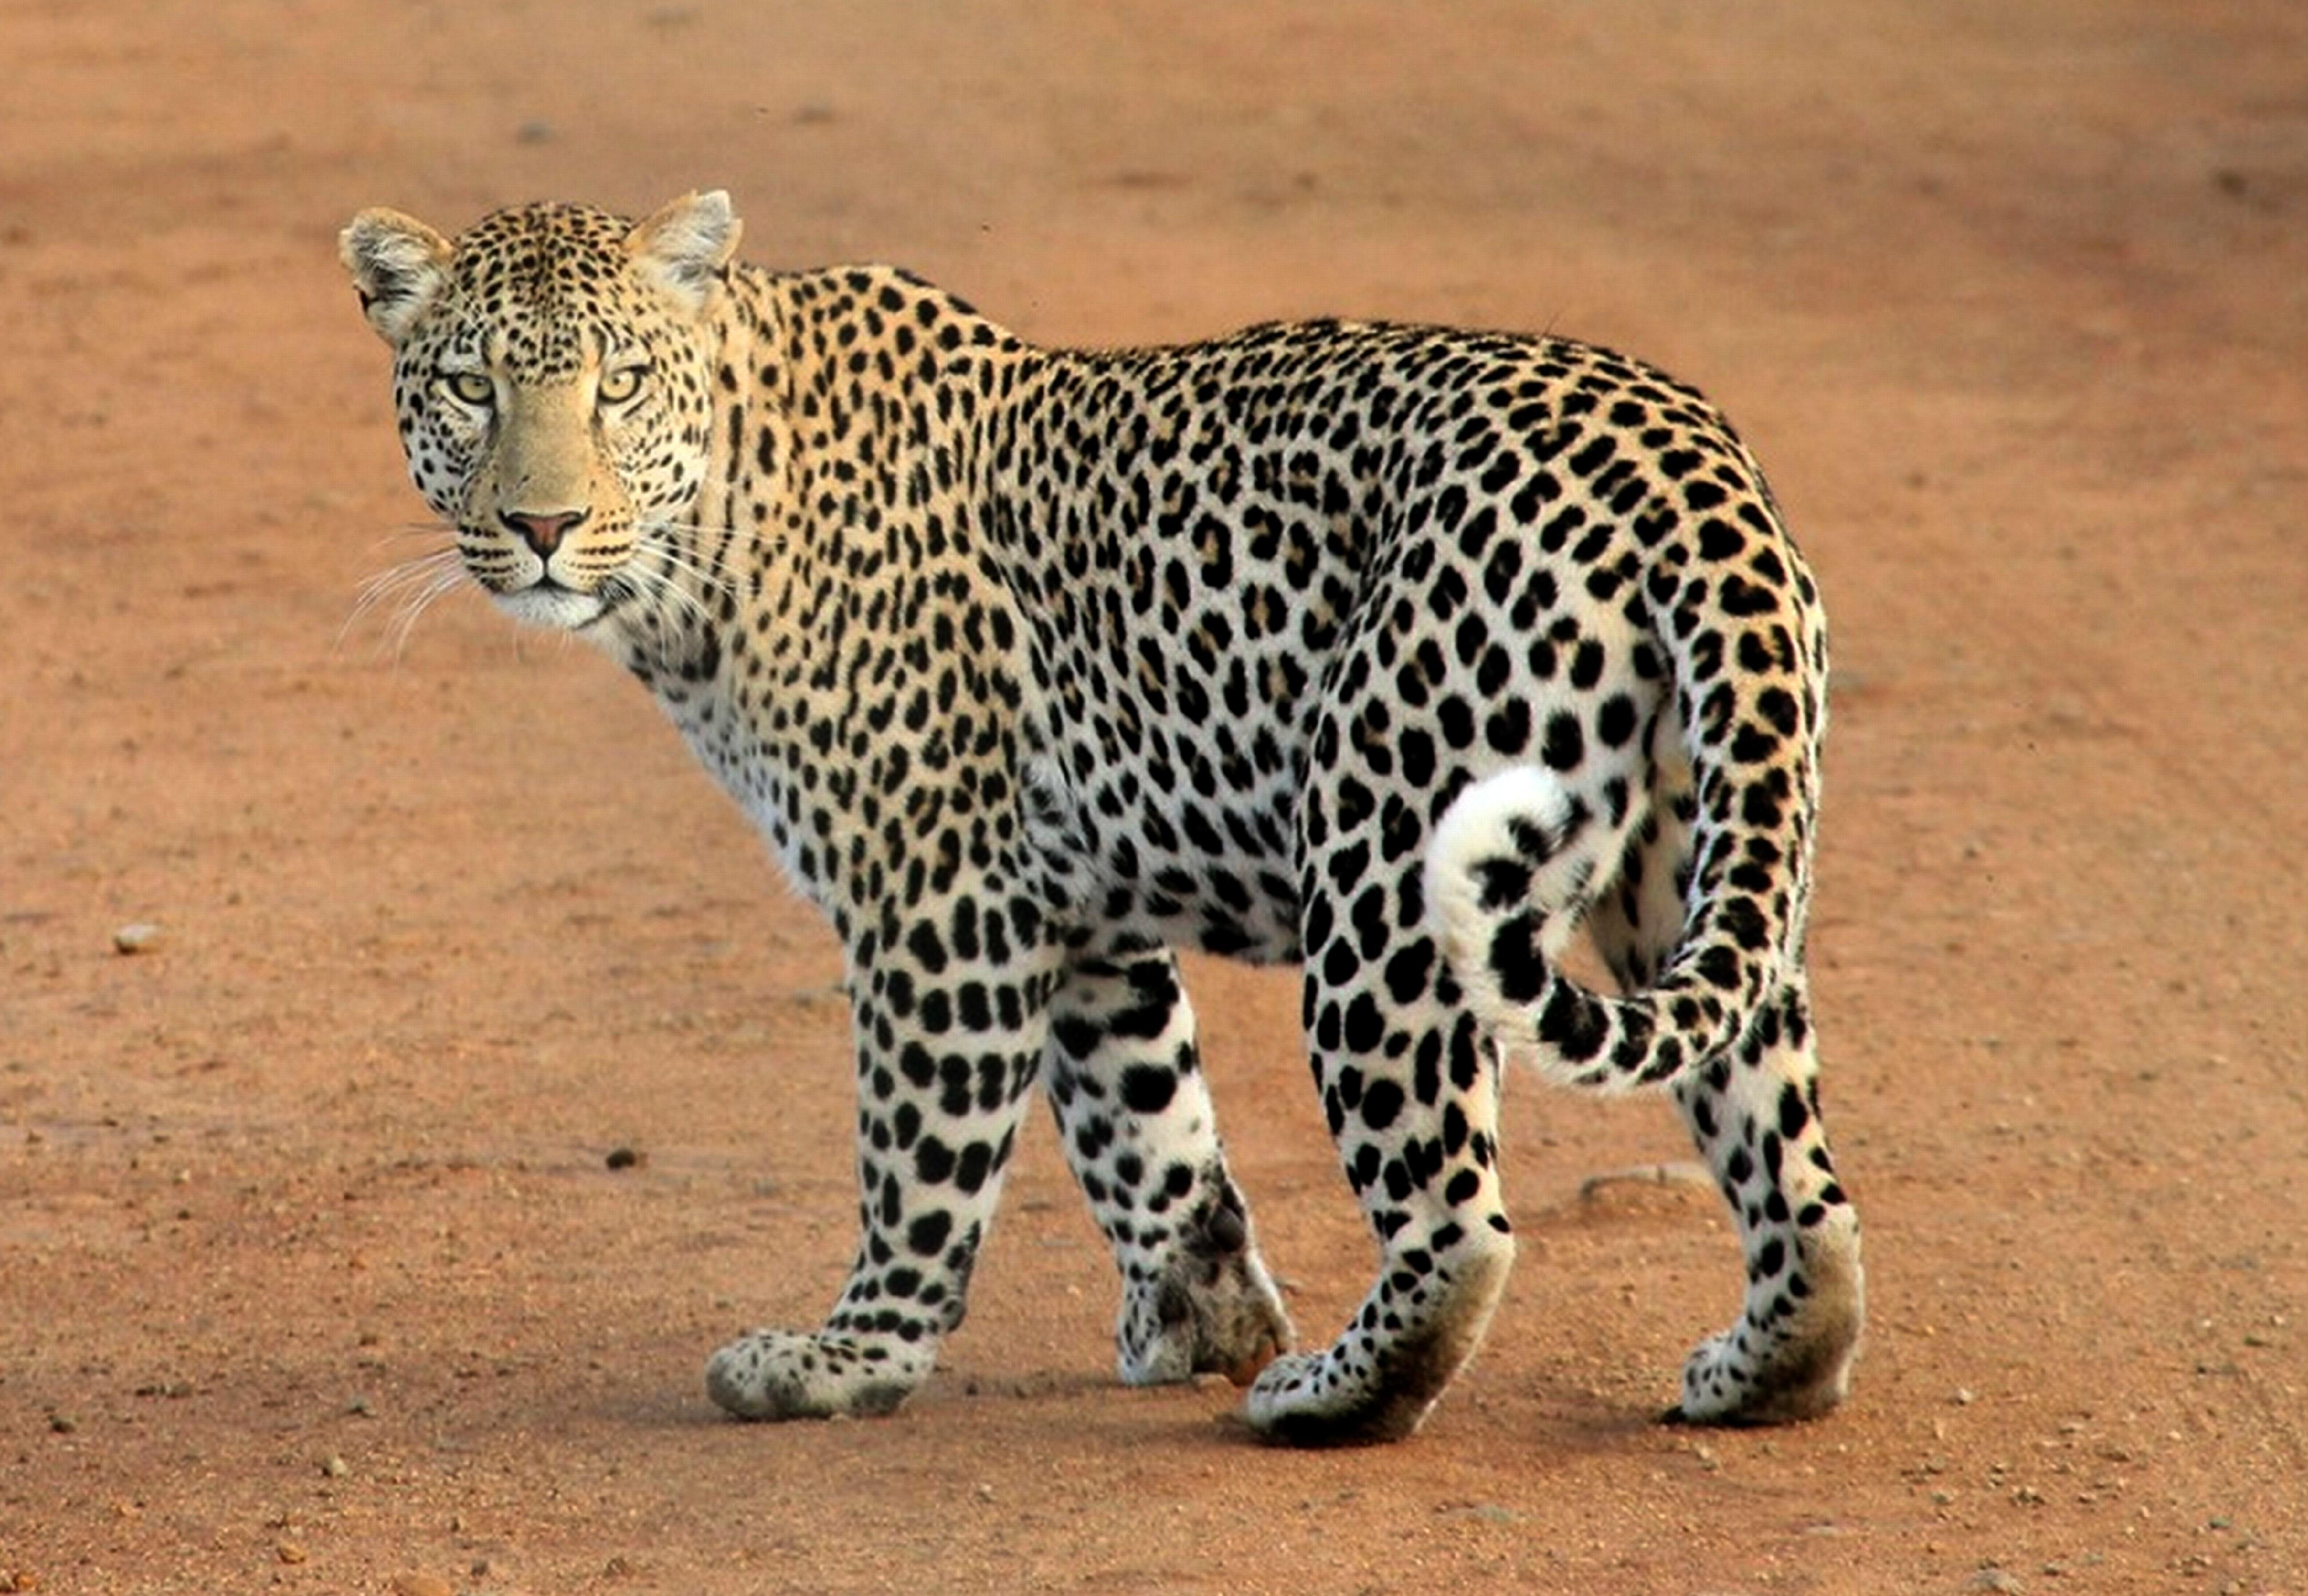 Image of: Indian Tiger Animal Pexels 1000 Great Wild Animals Photos Pexels Free Stock Photos